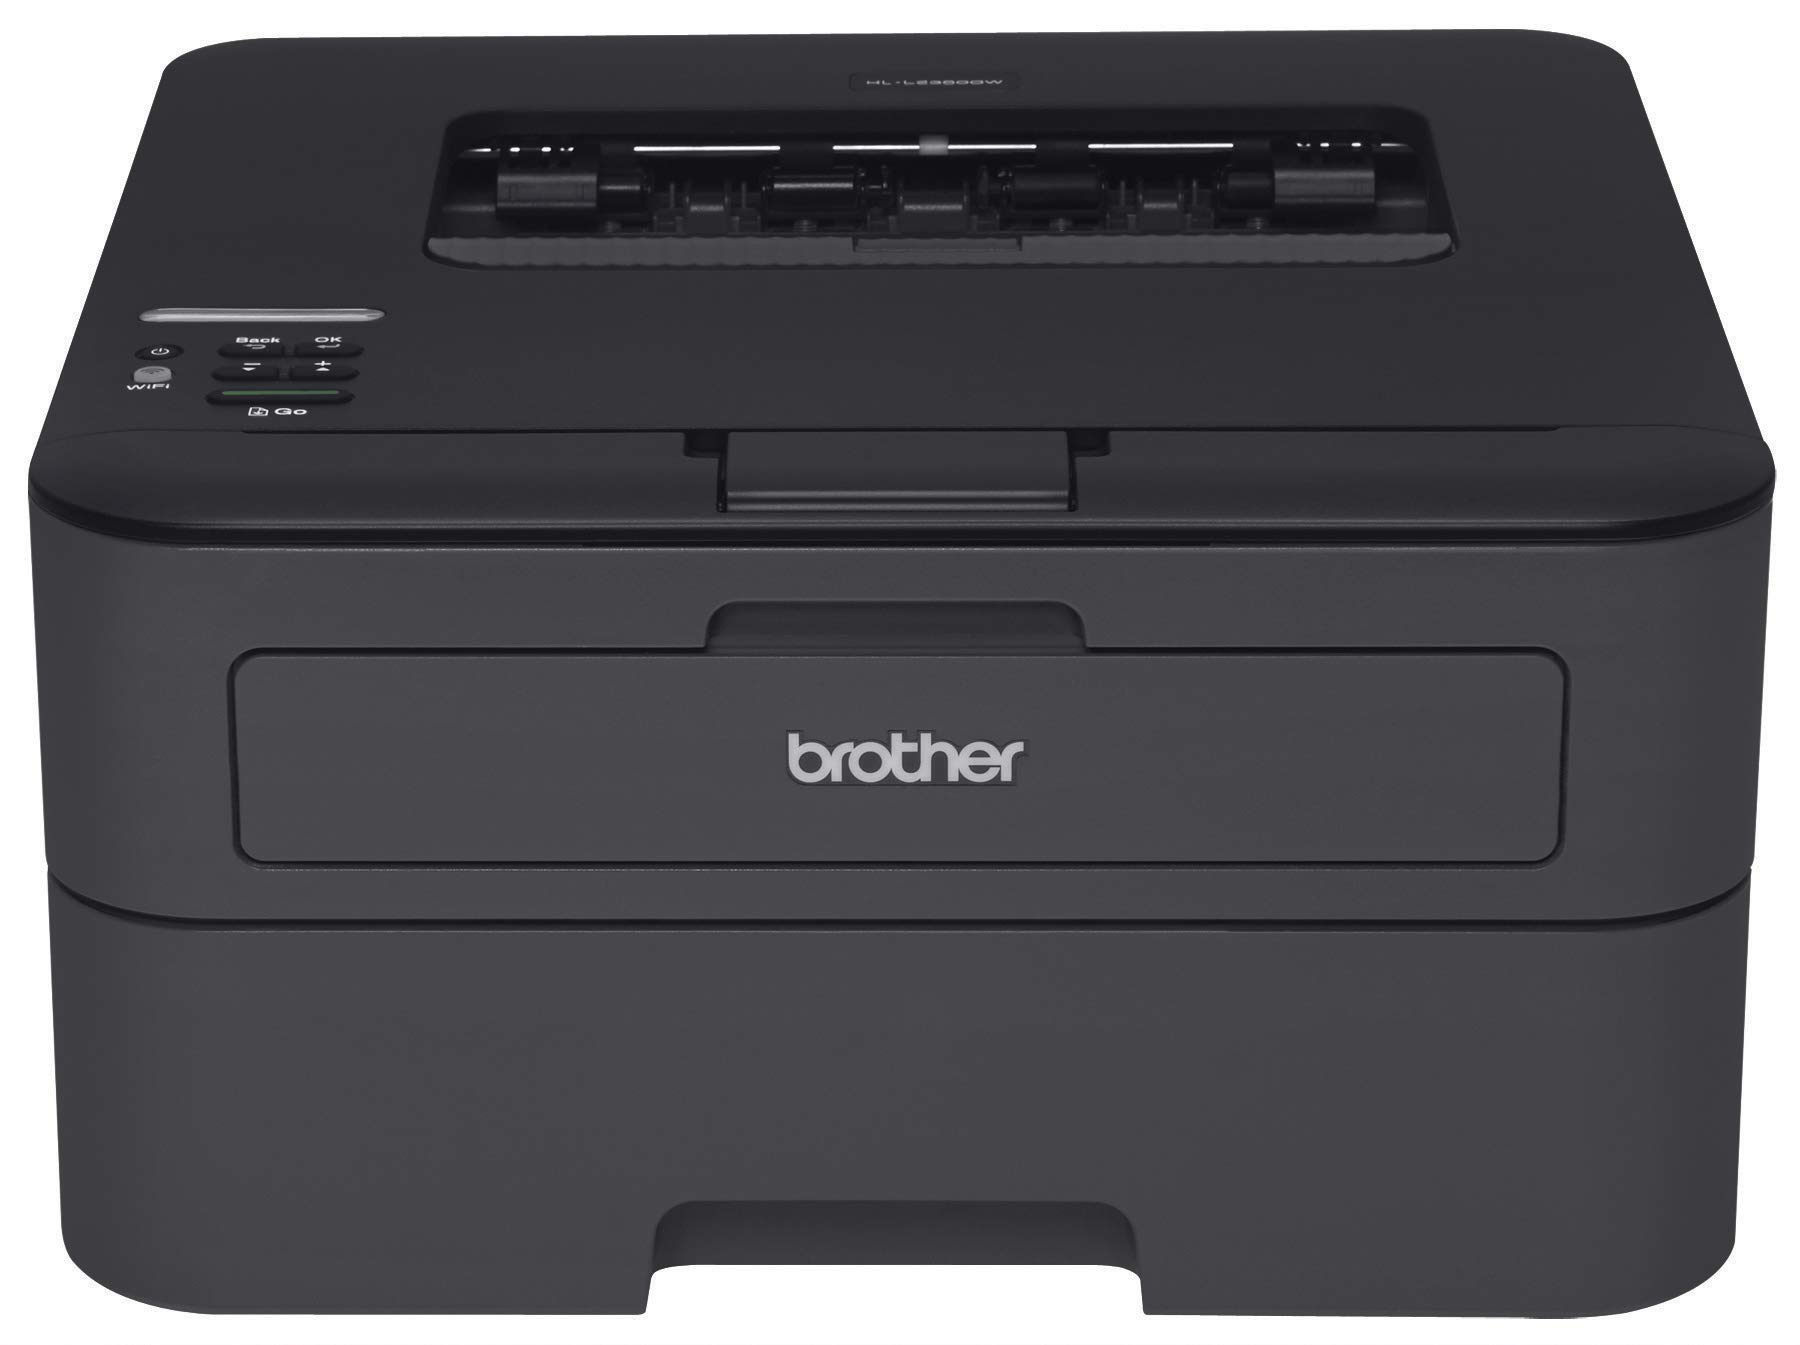 Brother Printer RHLL2360dw Monochrome Printer Black